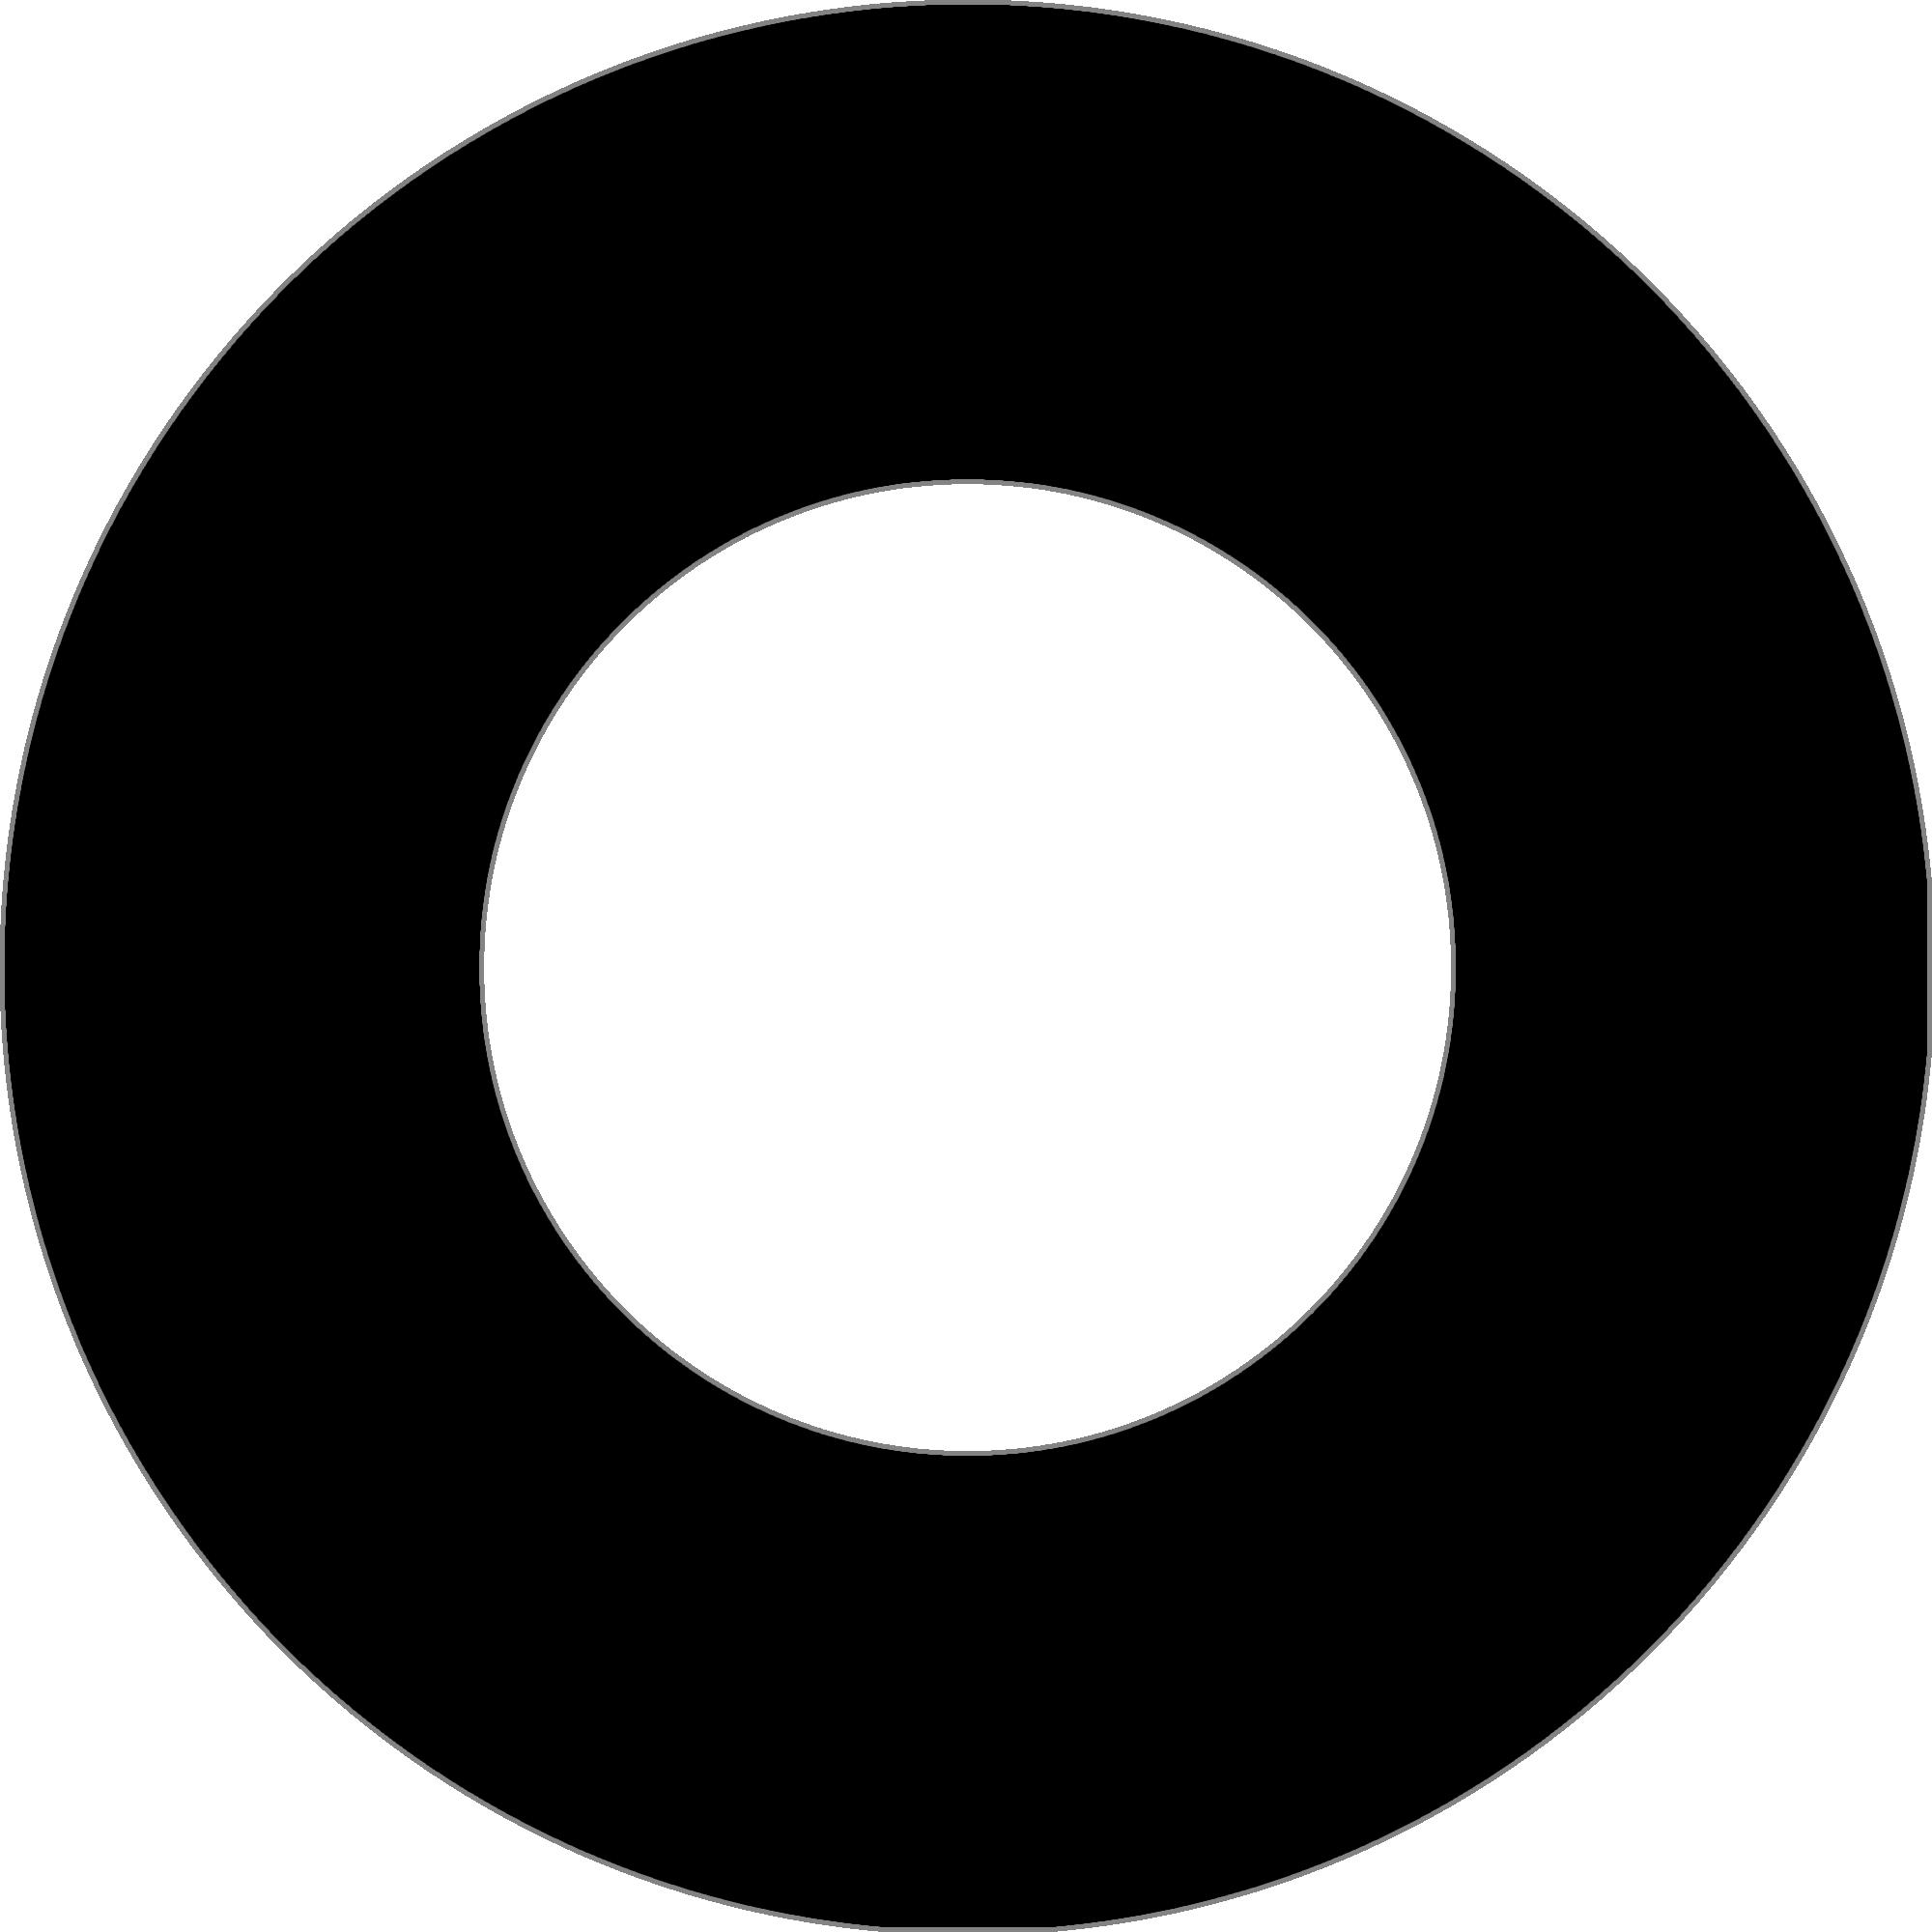 File:Black circle.png.